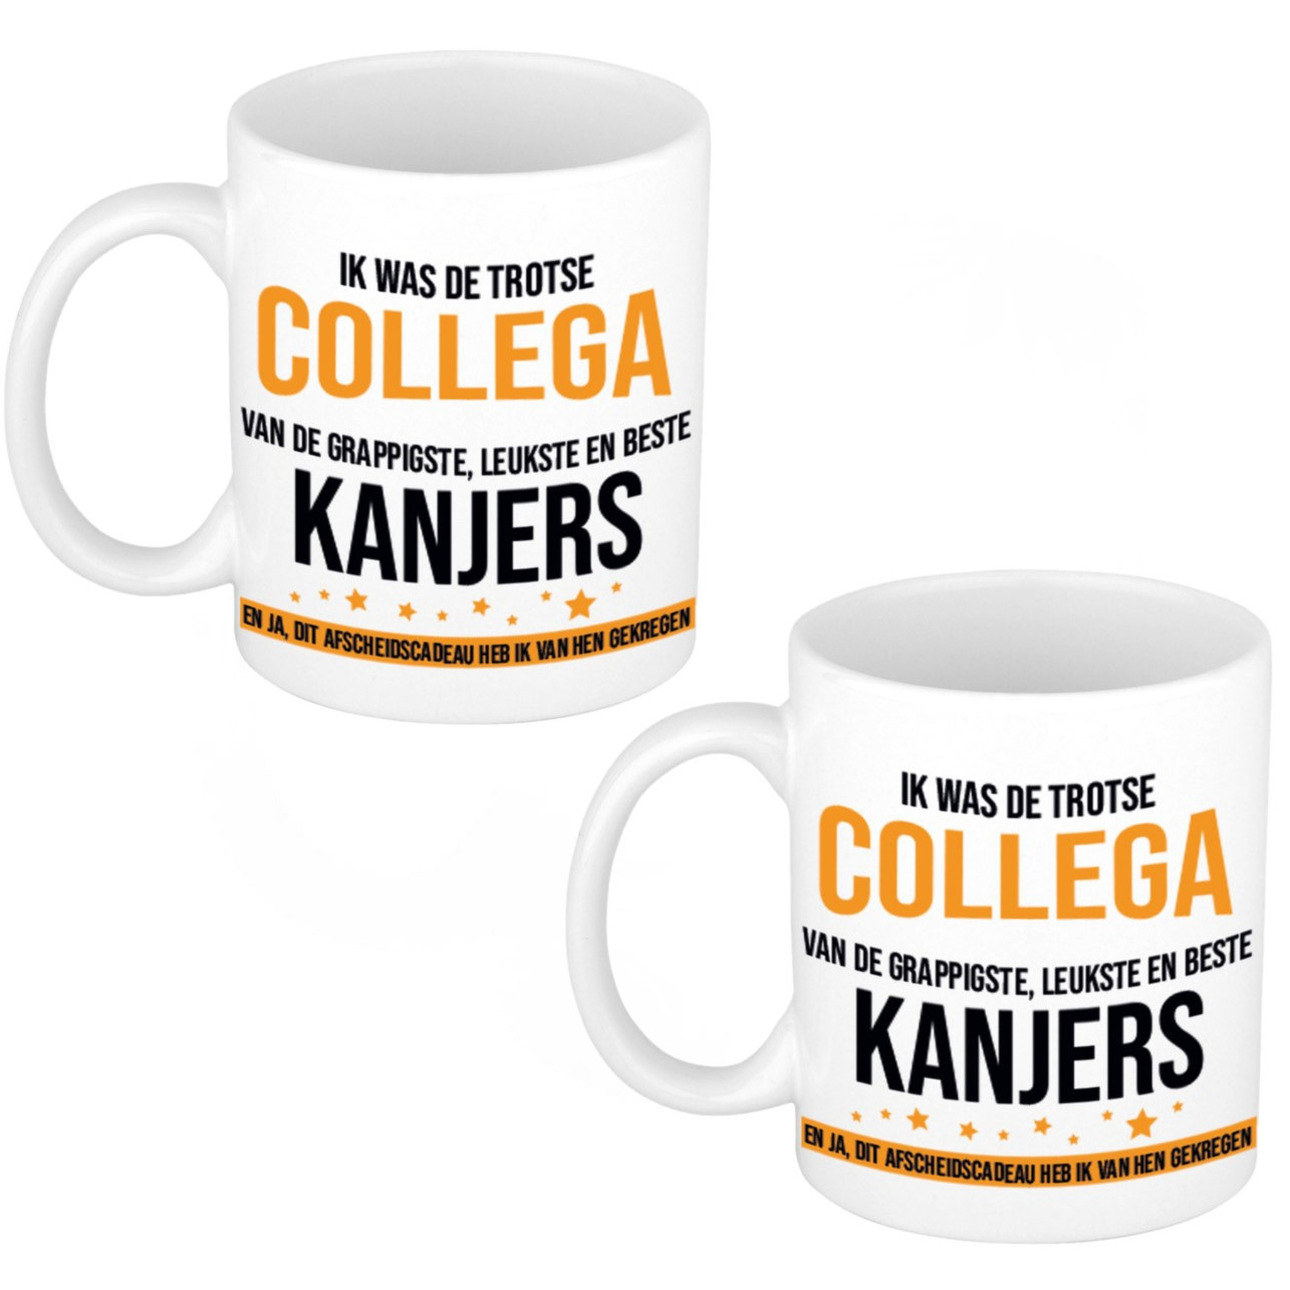 10x stuks trotse collega kanjers afscheidscadeau koffiemok - theebeker 300 ml